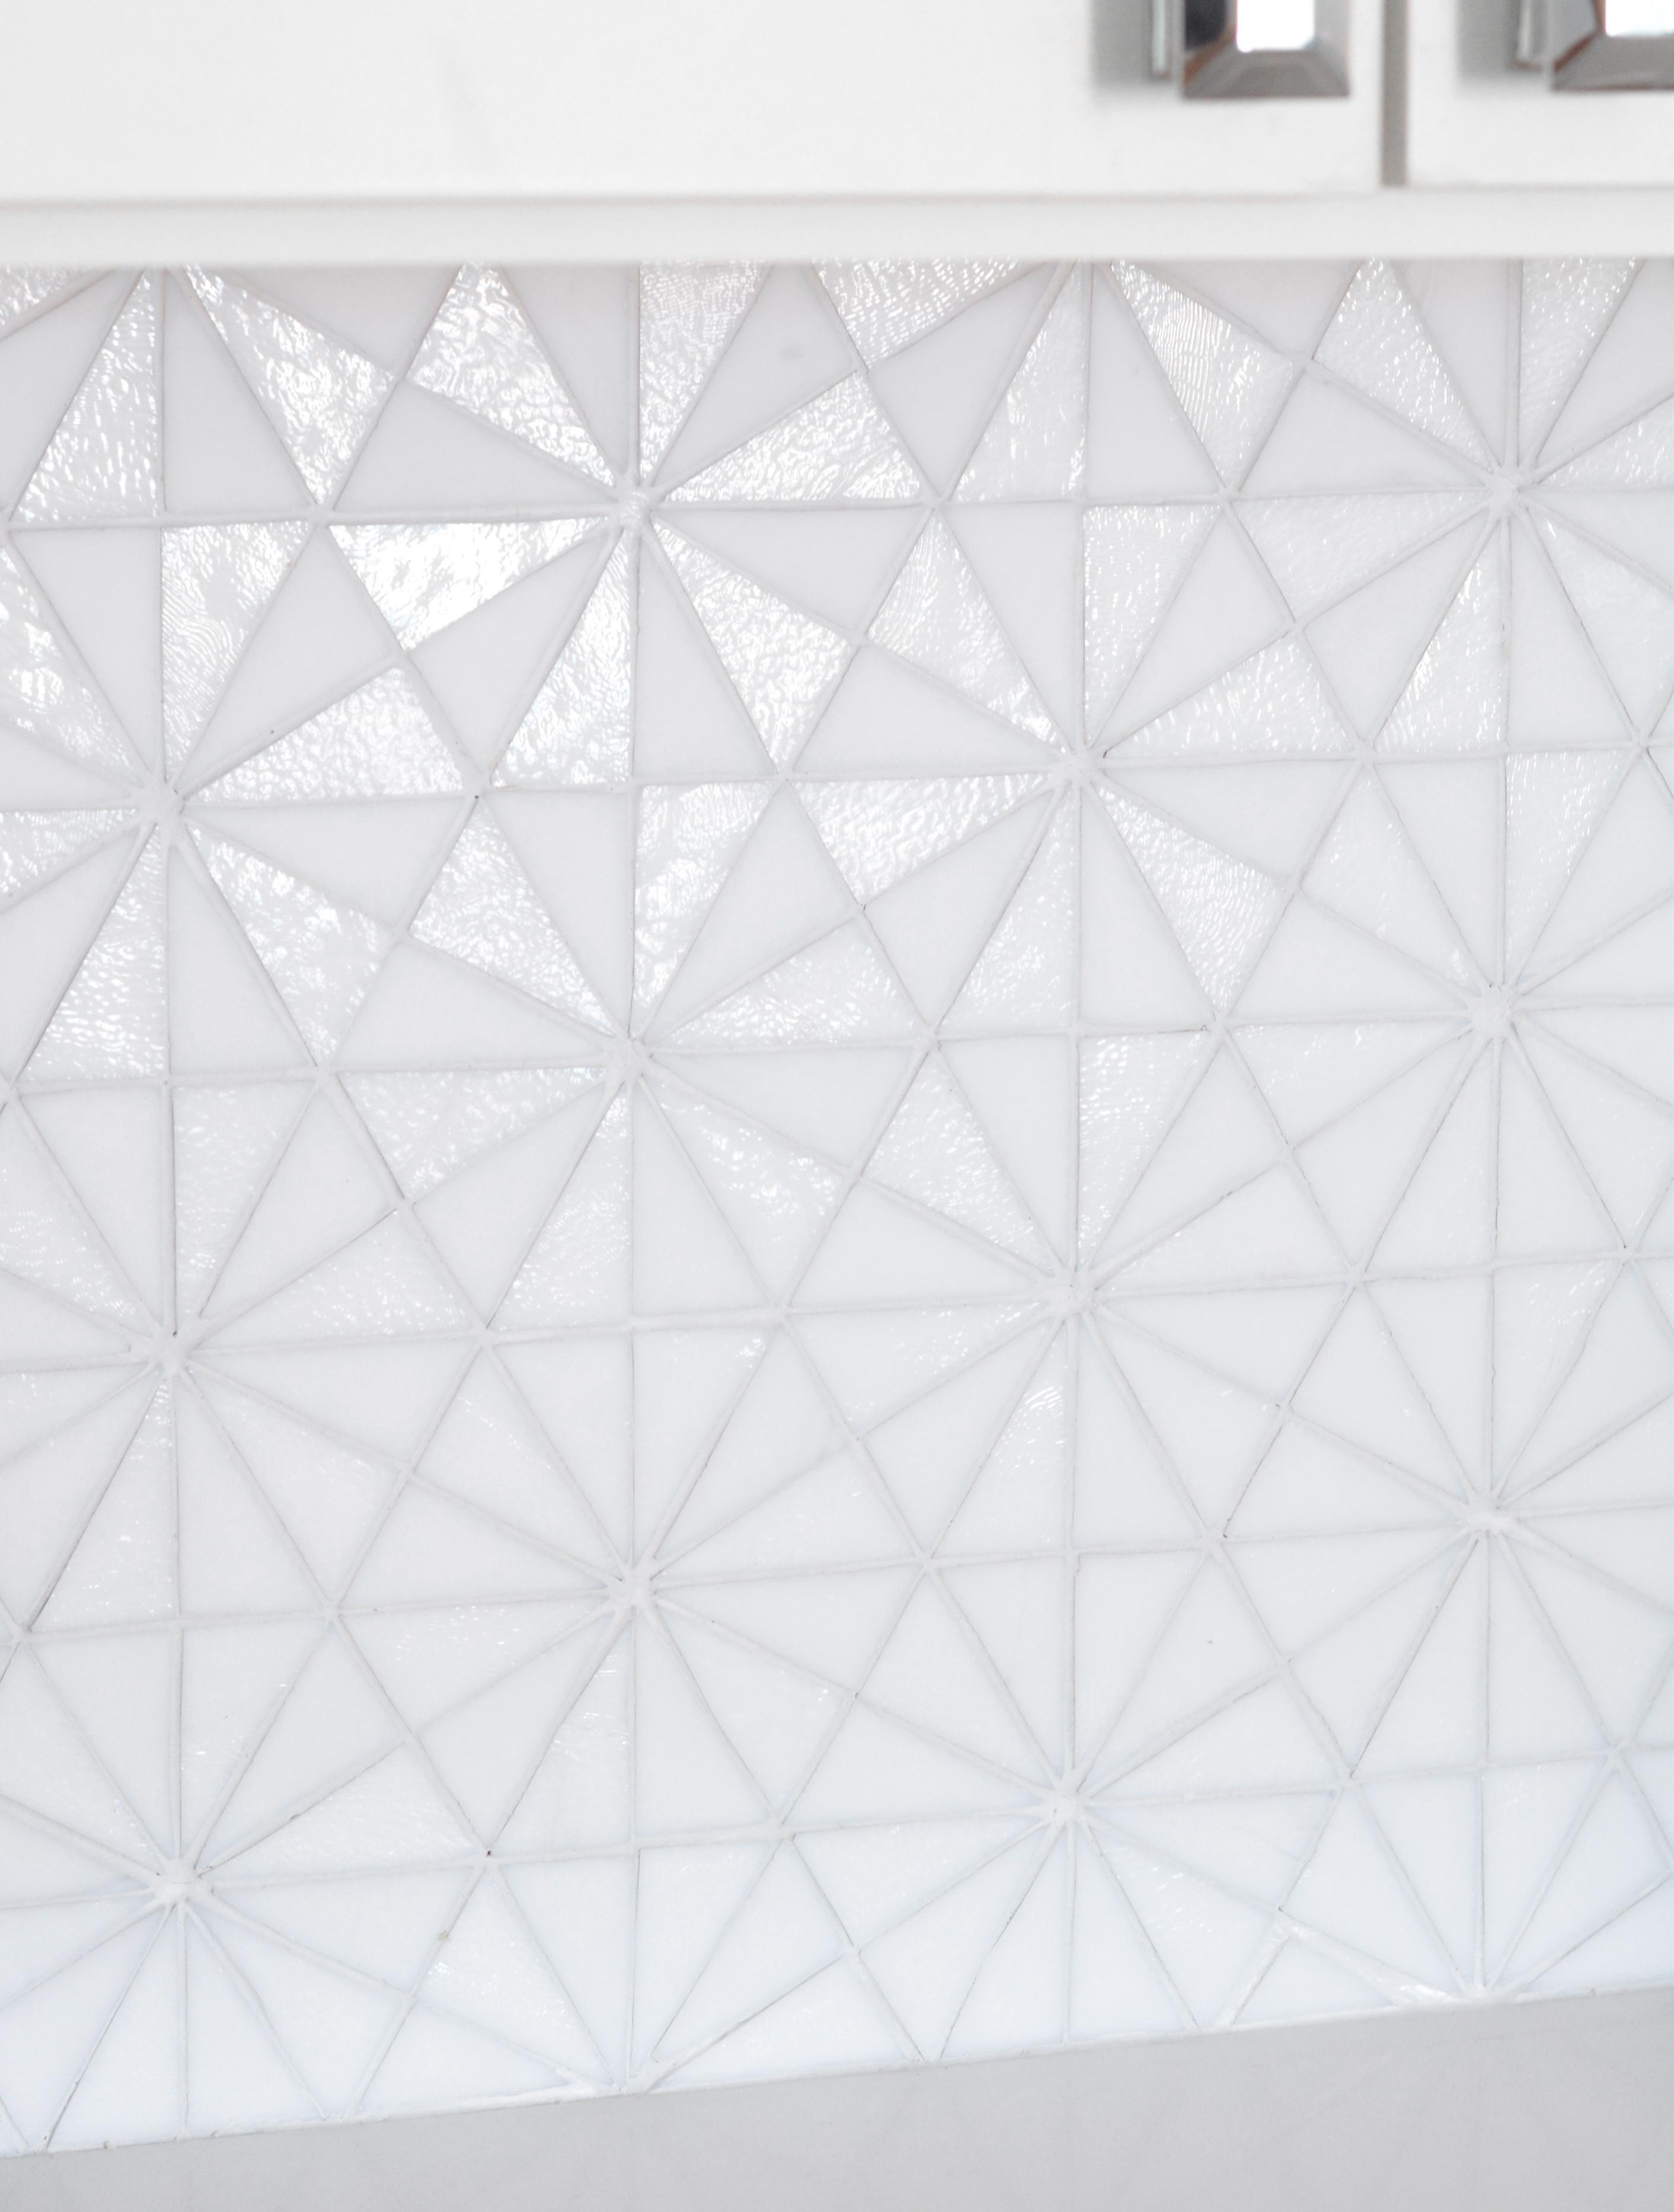 Glass Tile Backsplash Detail Copy